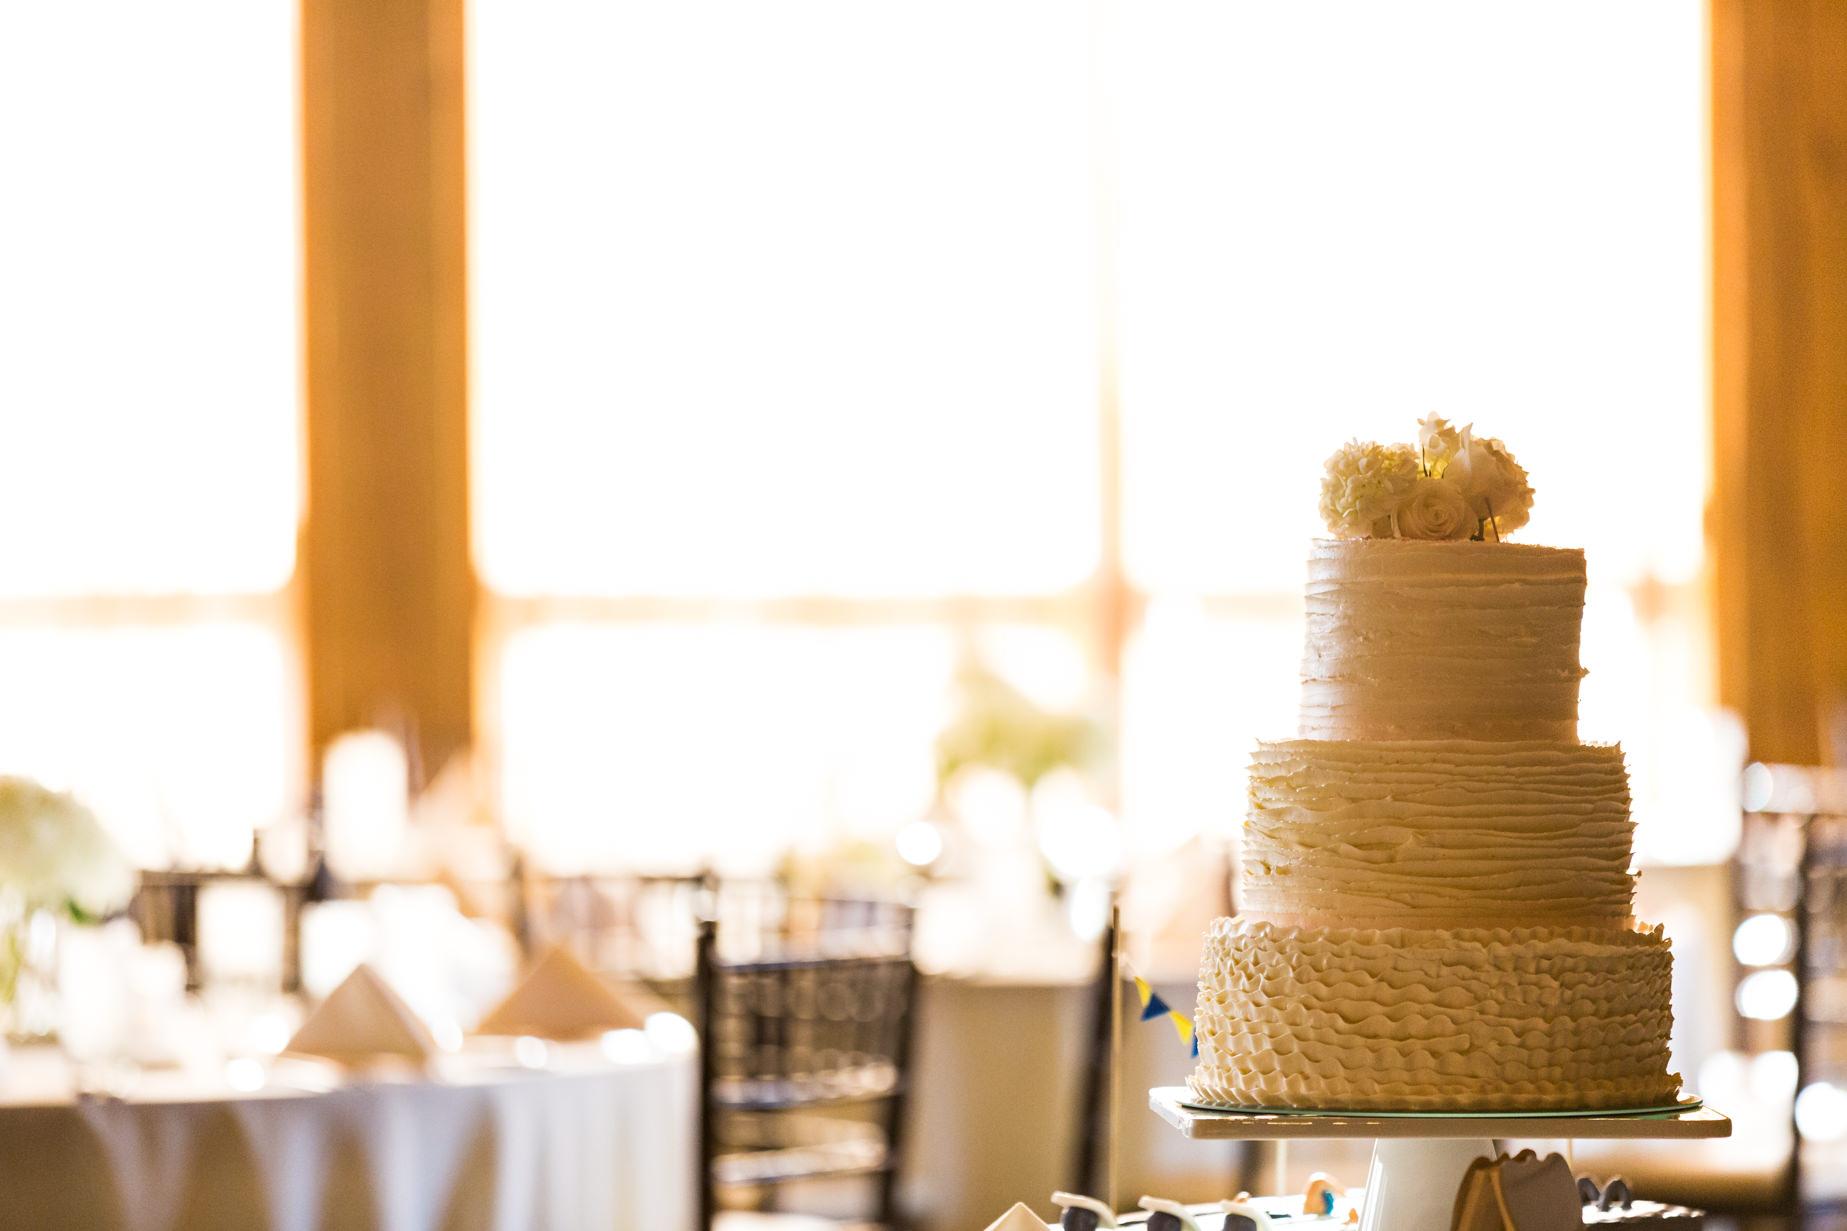 big-sky-resort-wedding-wedding-cake.jpg